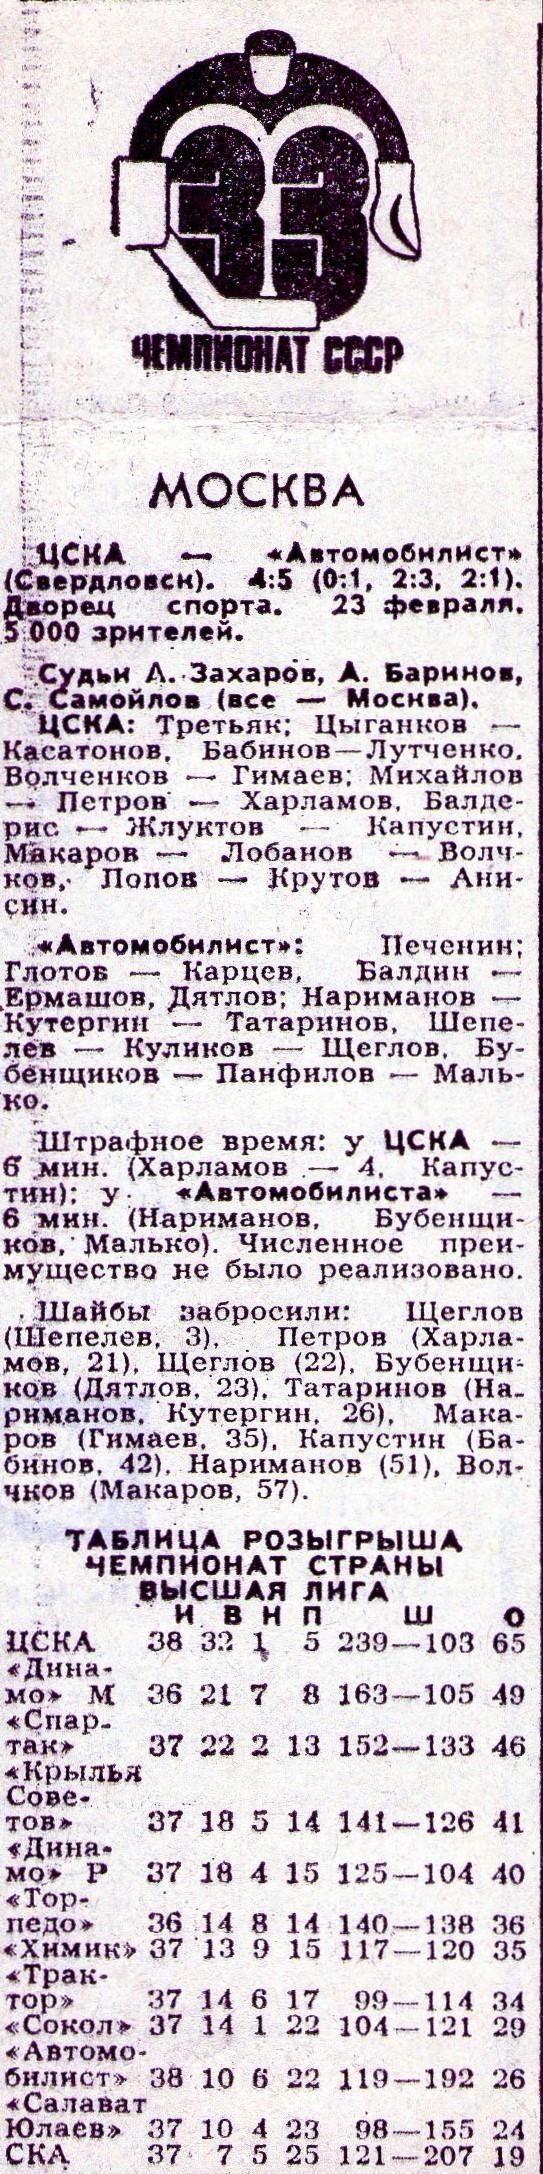 1979.02.23 ЦСКА 4-5 Автомобилист Св..jpg